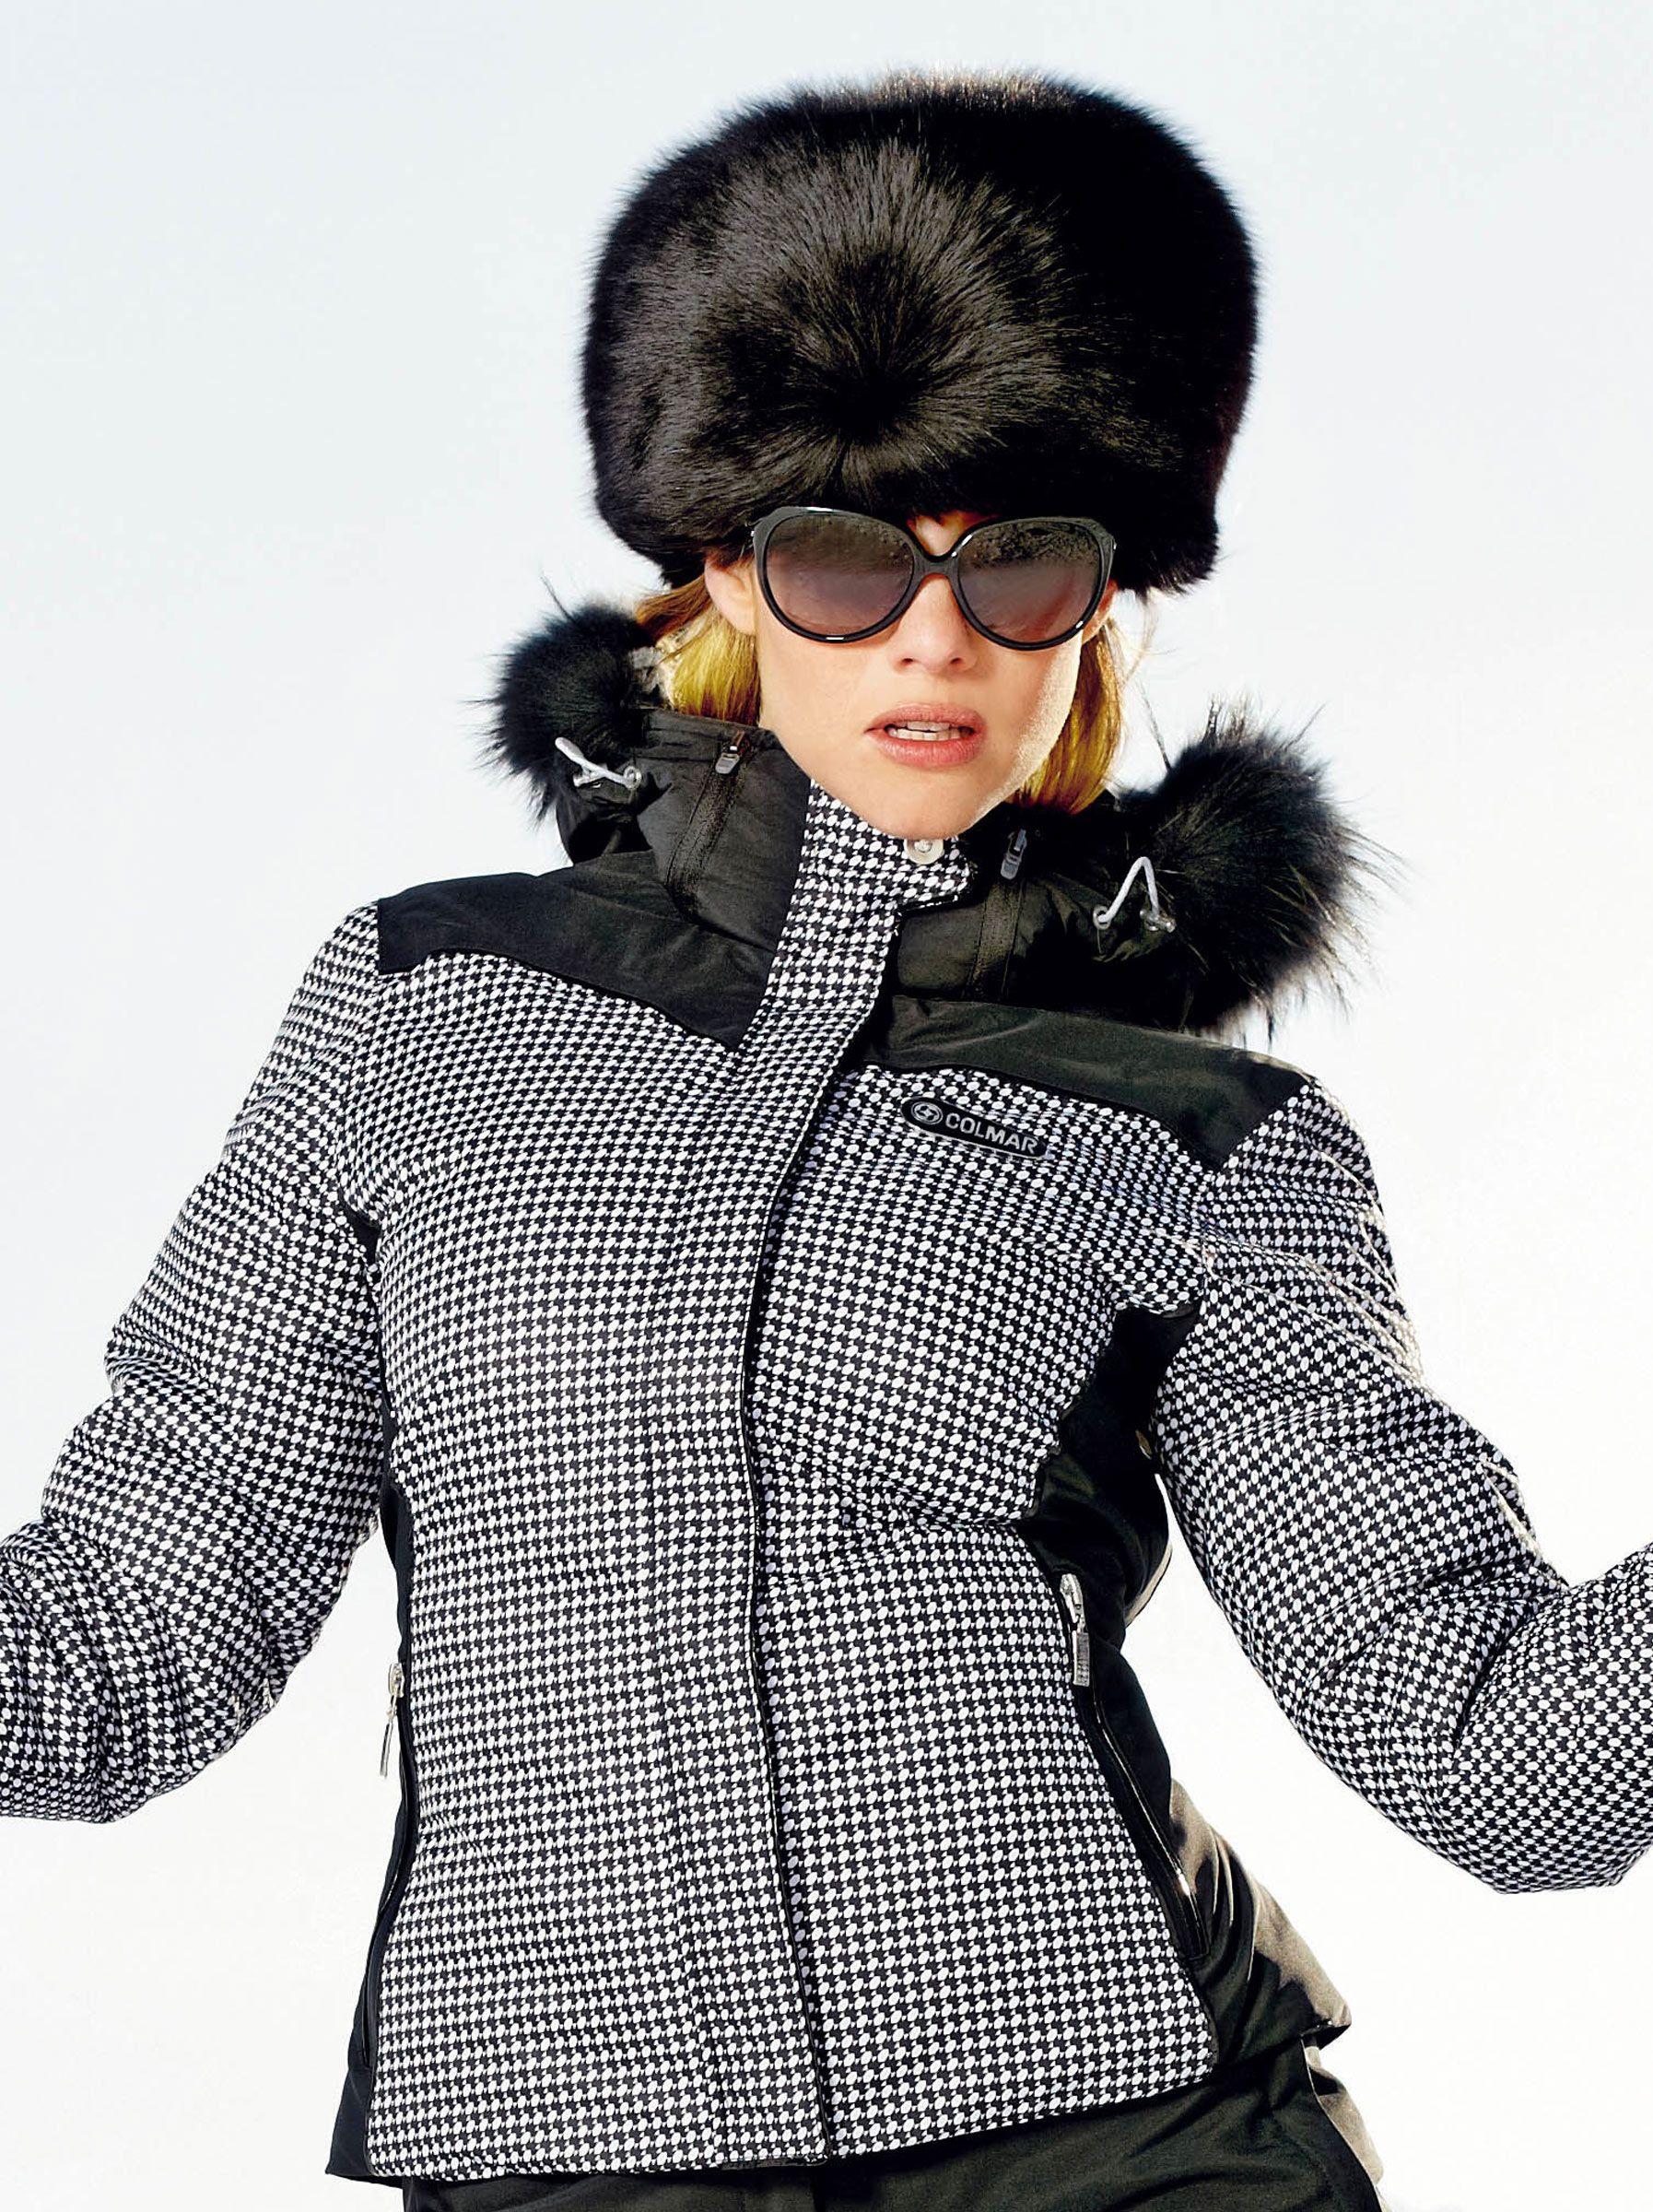 Colmar Cevina Ski Jacket for Women. European  ski  fashion for  women. 029f404ac